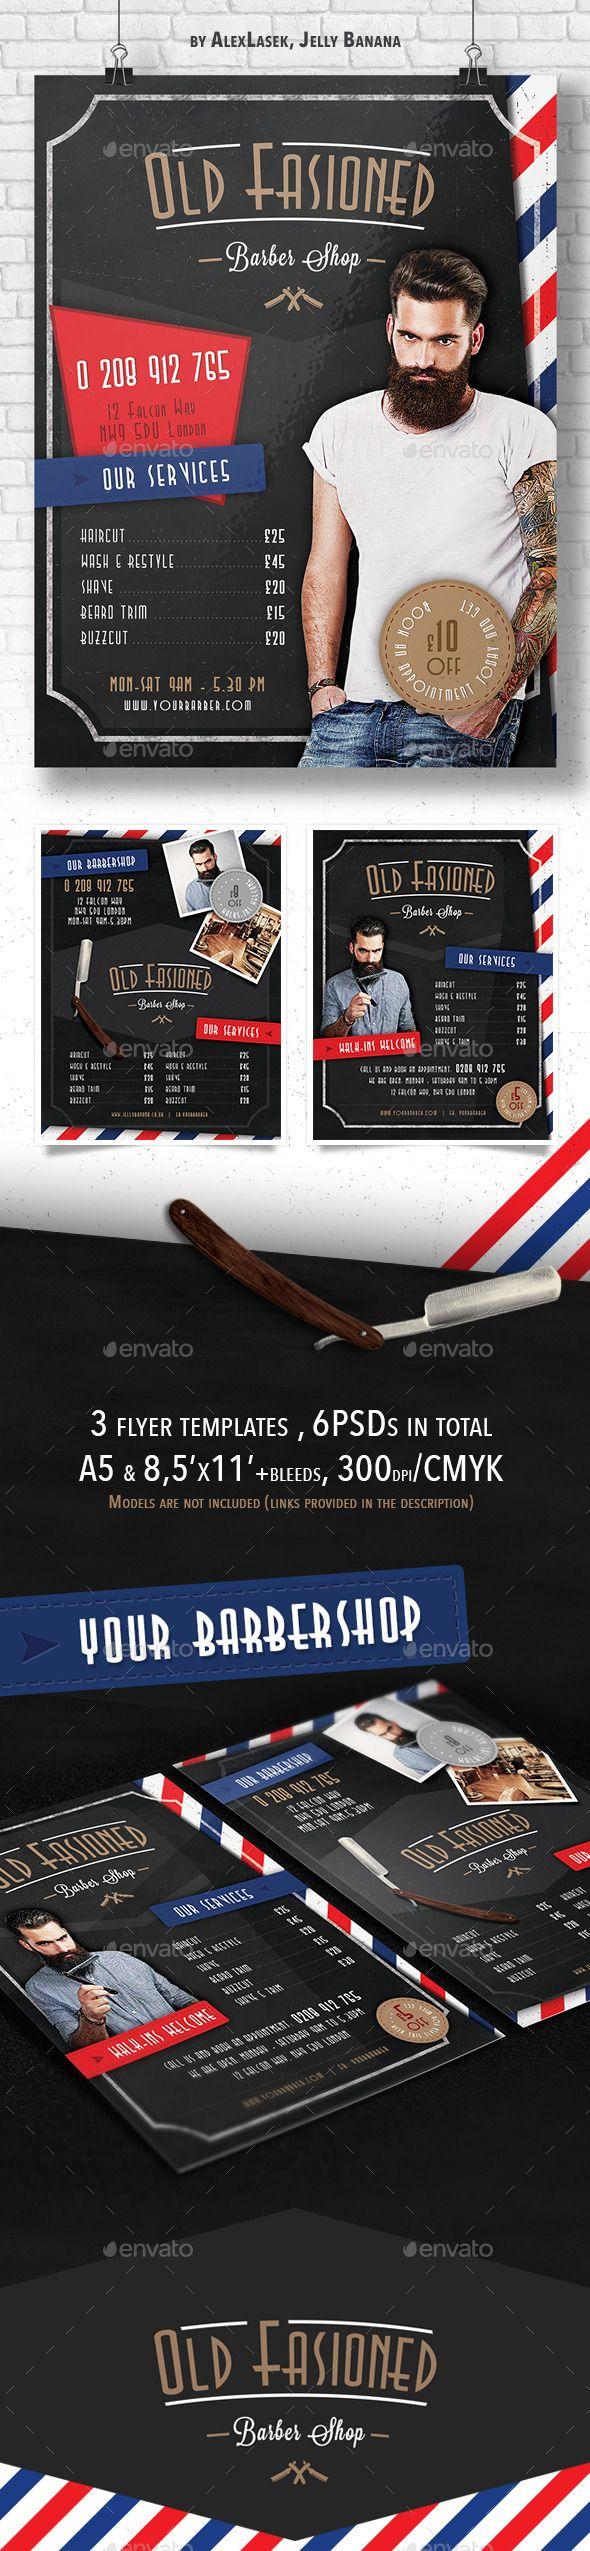 3 Old Fashioned Barber Shop Flyer Templates 6 PSD #design Download: http://graphicriver.net/item/3-old-fashioned-barber-shop-flyer-templates-6psd/12497976?ref=ksioks